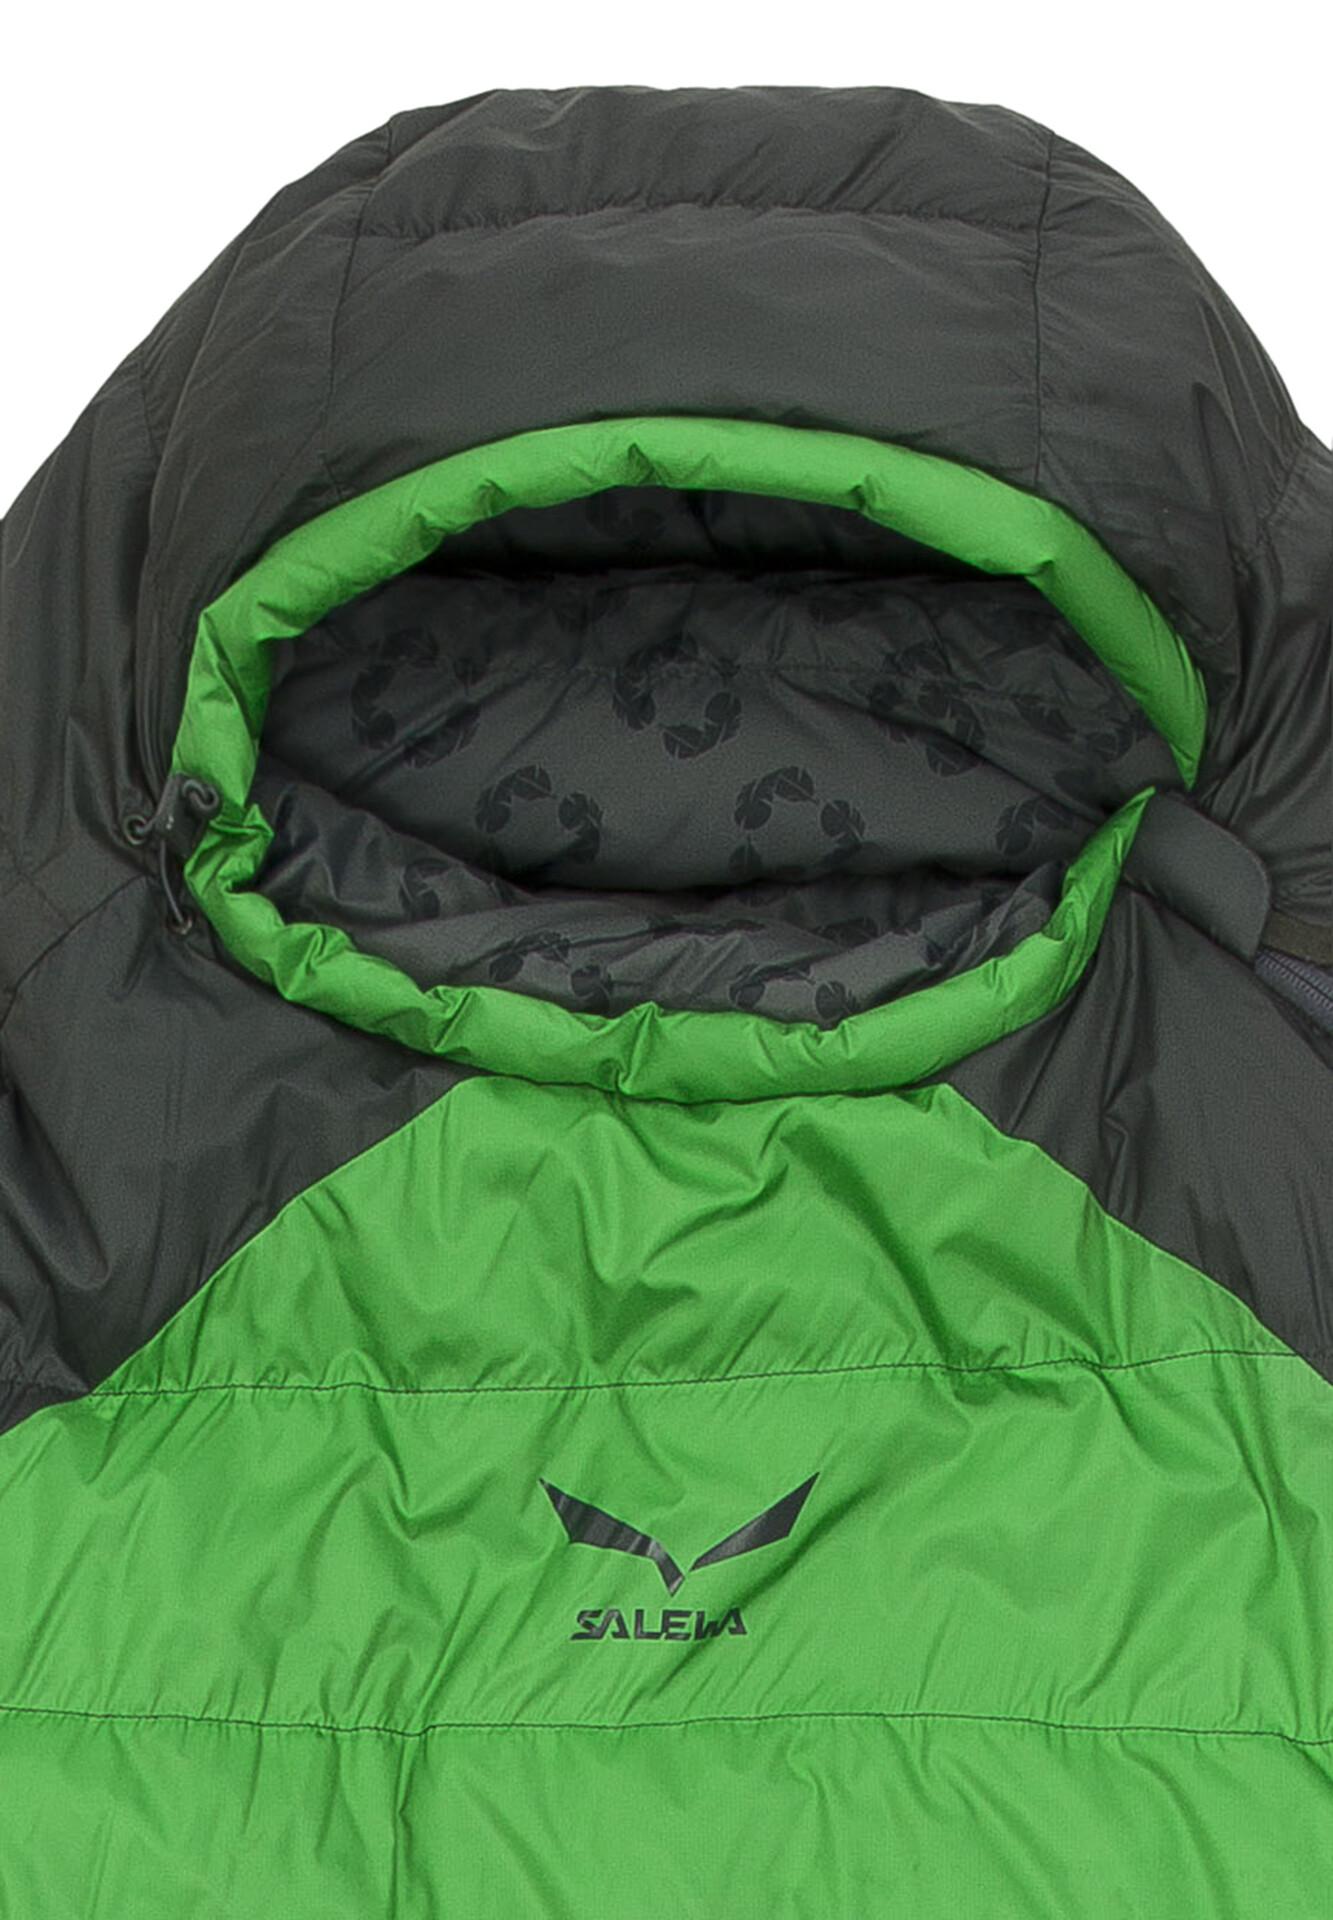 Salewa Eco Eco Eco -1 Sleeping Bag Eucalyptus (2019) 4fa30d